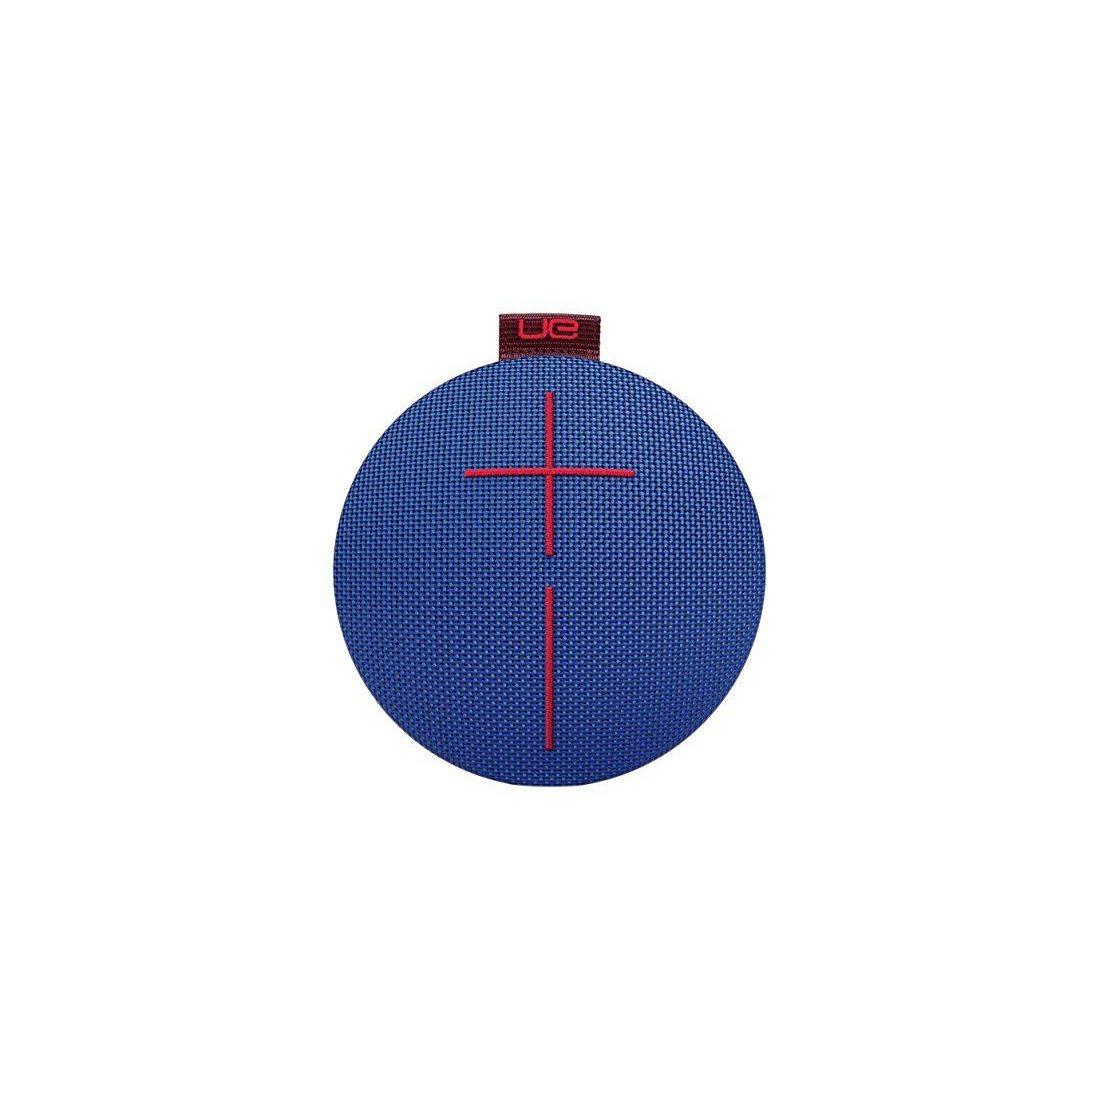 Ultimate EarsROLL2 Enceinte Bluetooth Ultraportable avec Flotteur, Waterproof et Antichoc - Bleu/Rouge